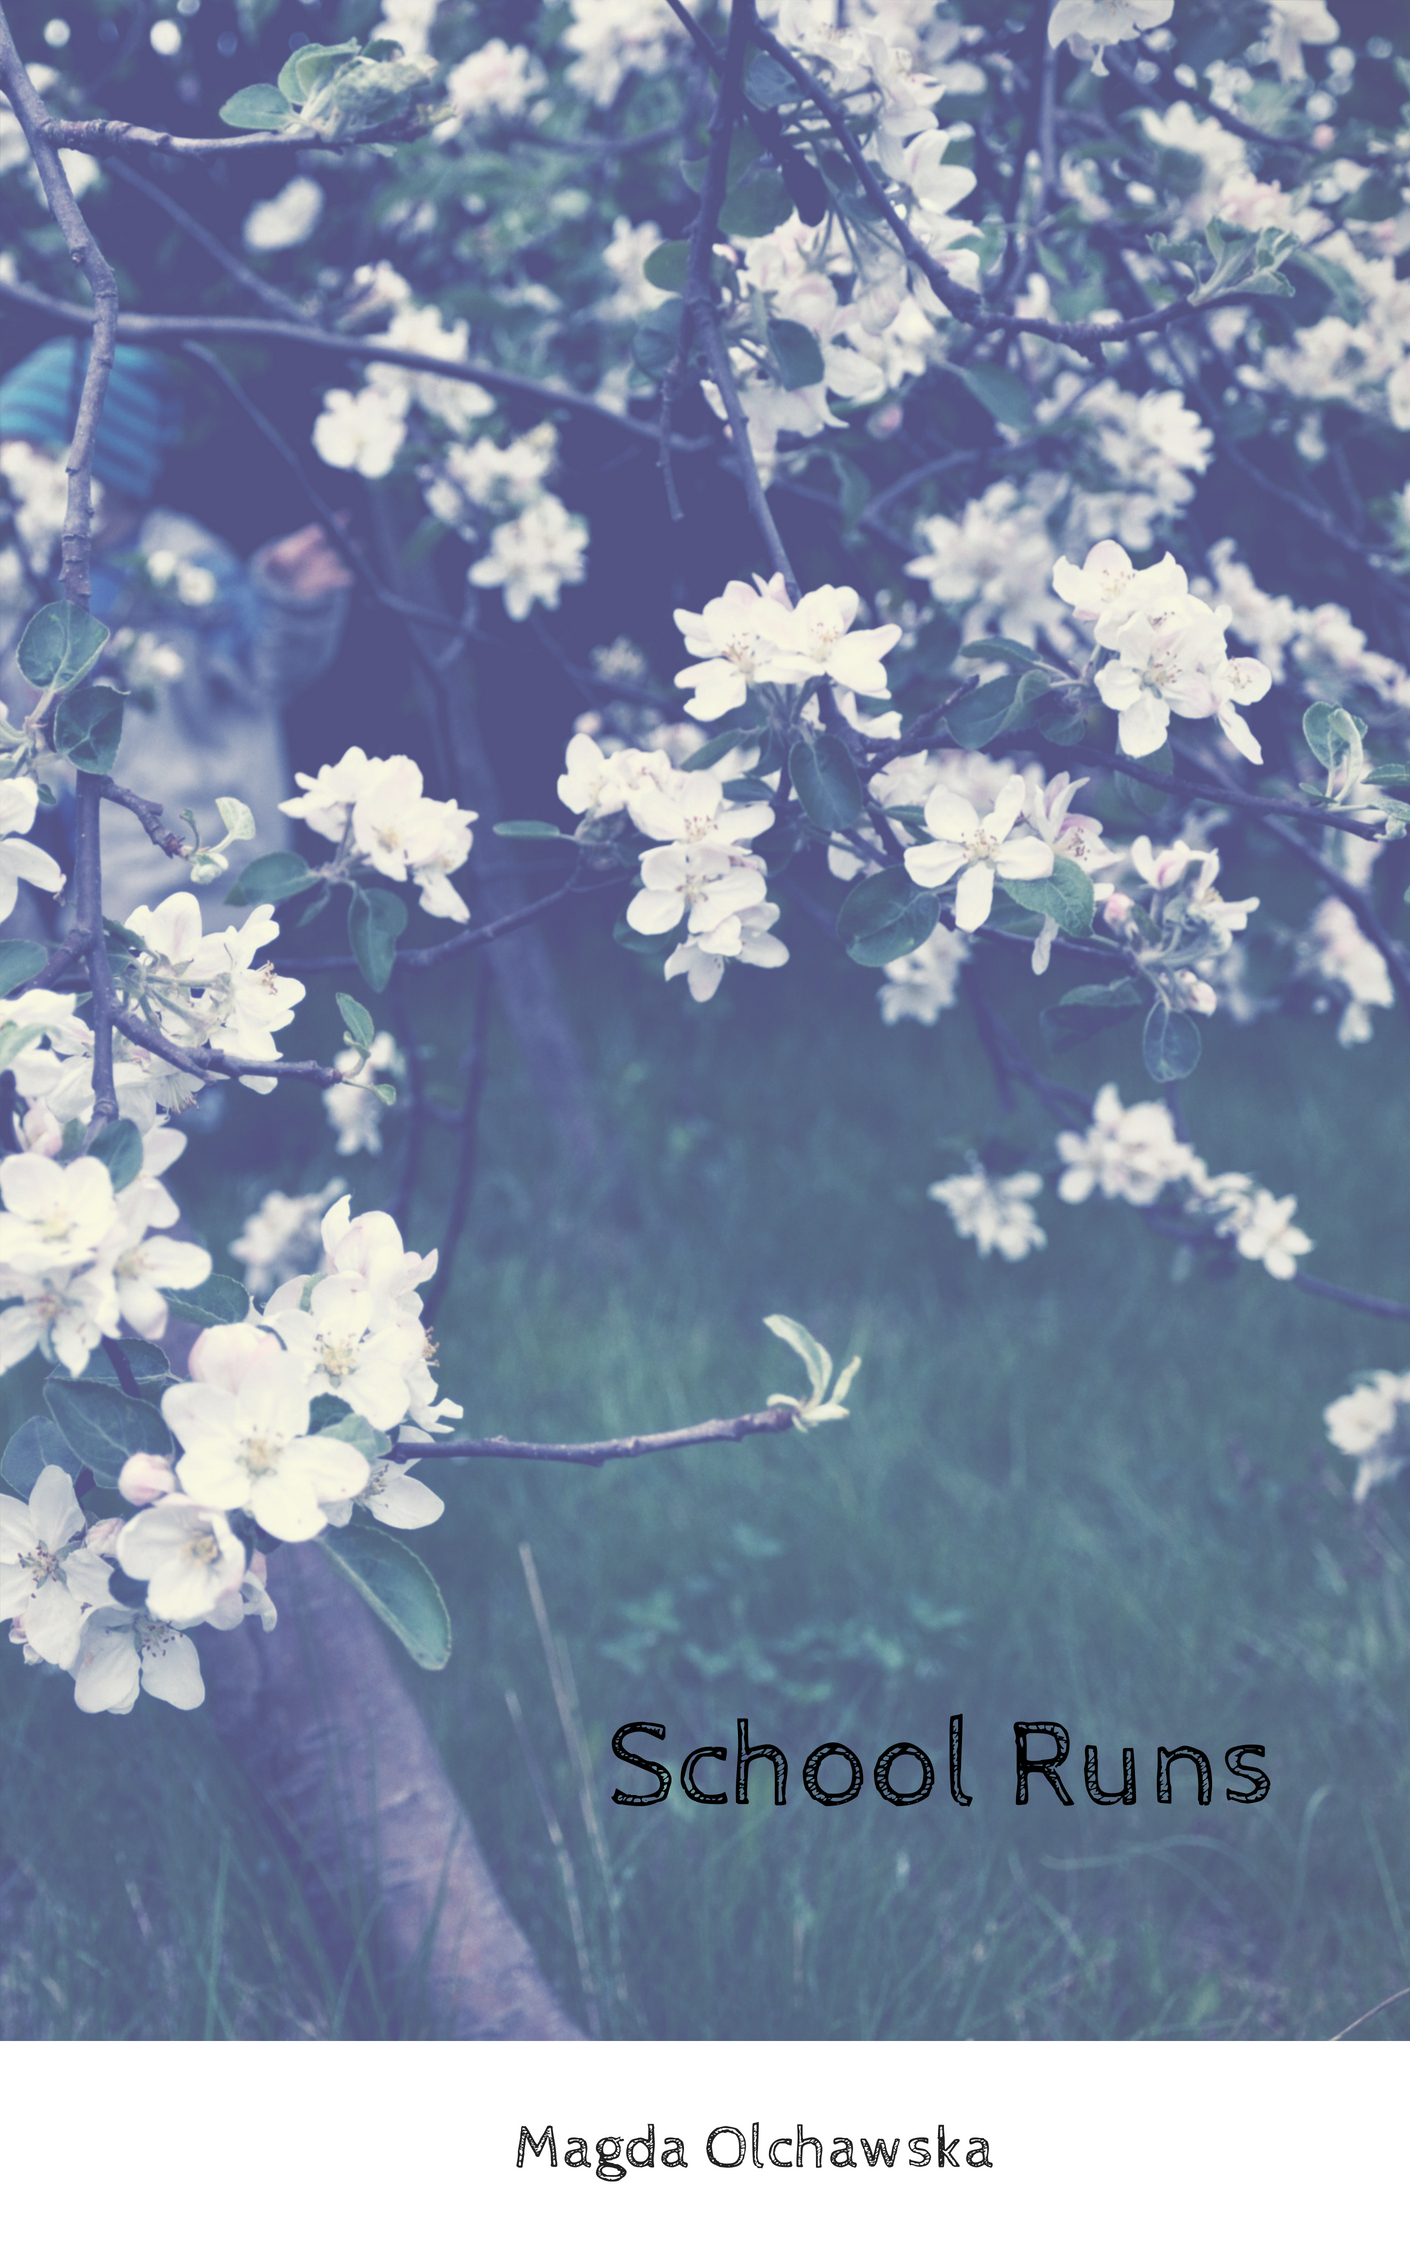 School Runs Weekly Episodic Story by Magda Olchawska